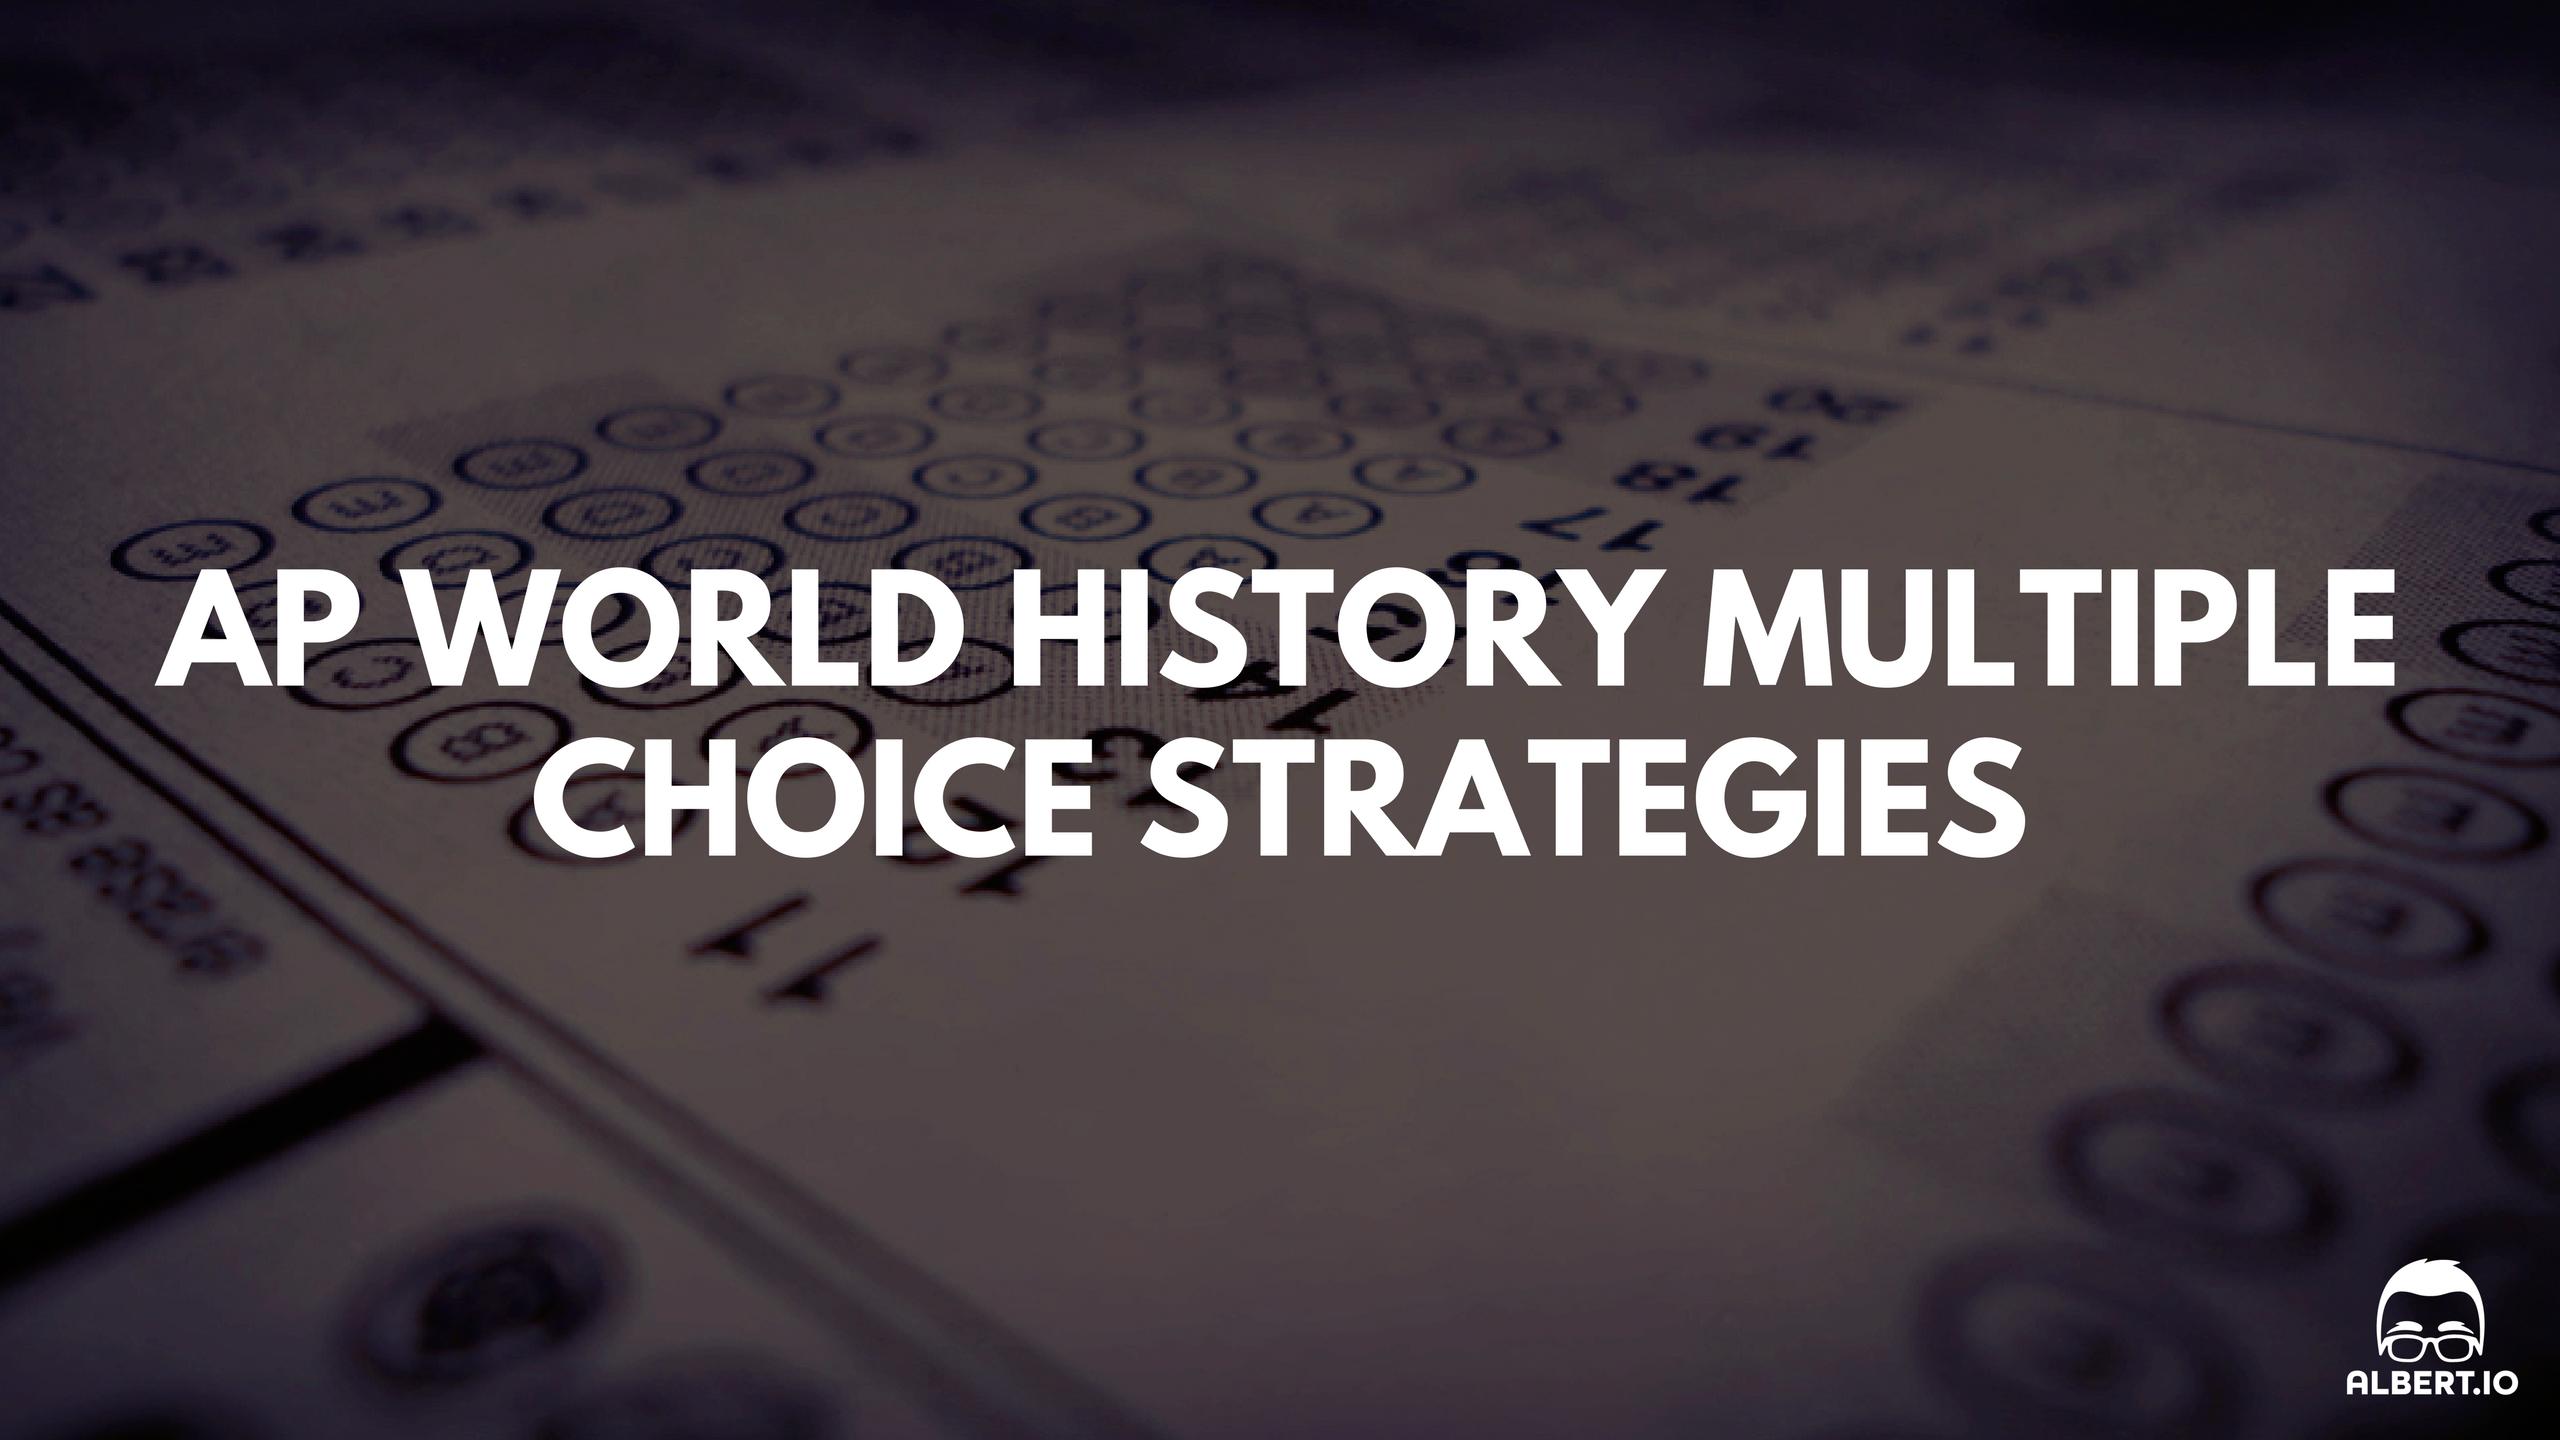 AP World History Multiple Choice Strategies | Albert io